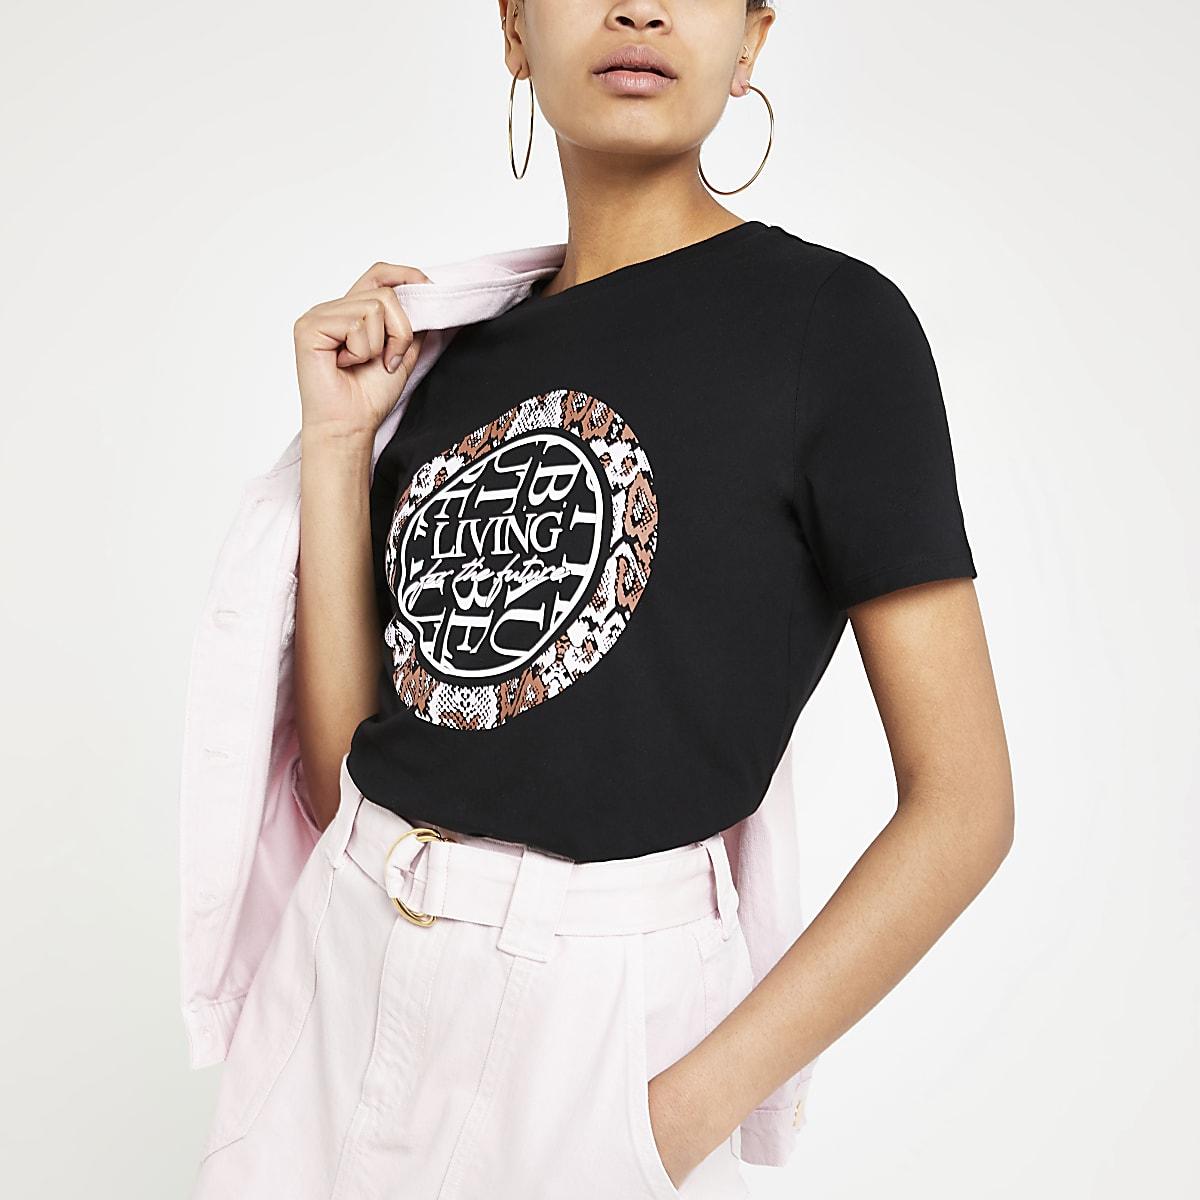 Black 'Living for the future' T-shirt